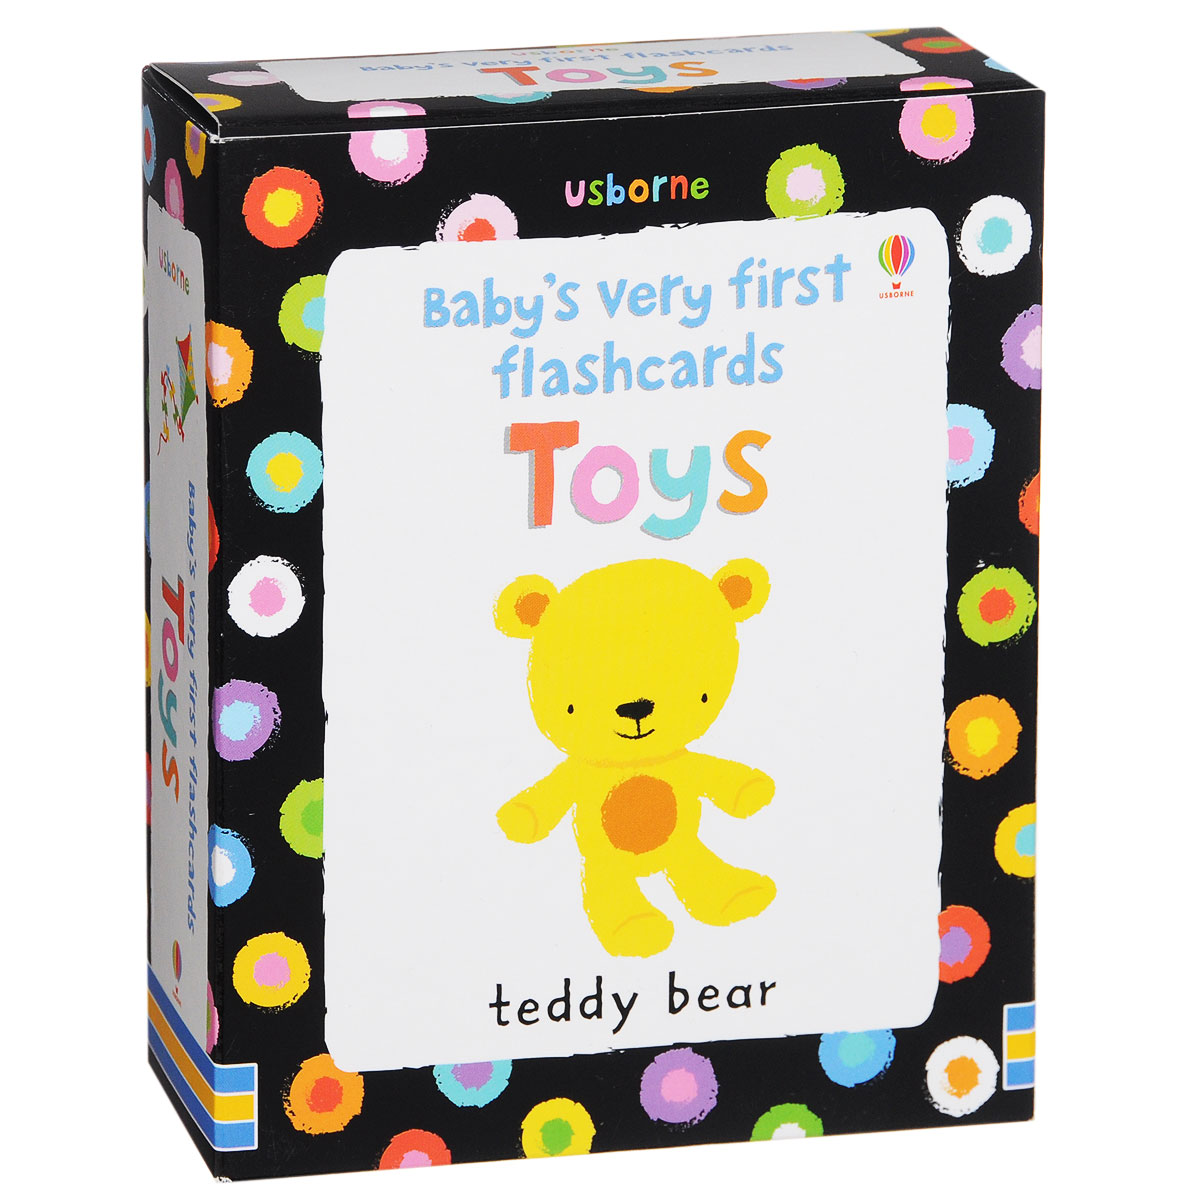 Toys: Baby's Very First Flashcards (набор из 10 карточек) 123 flashcards